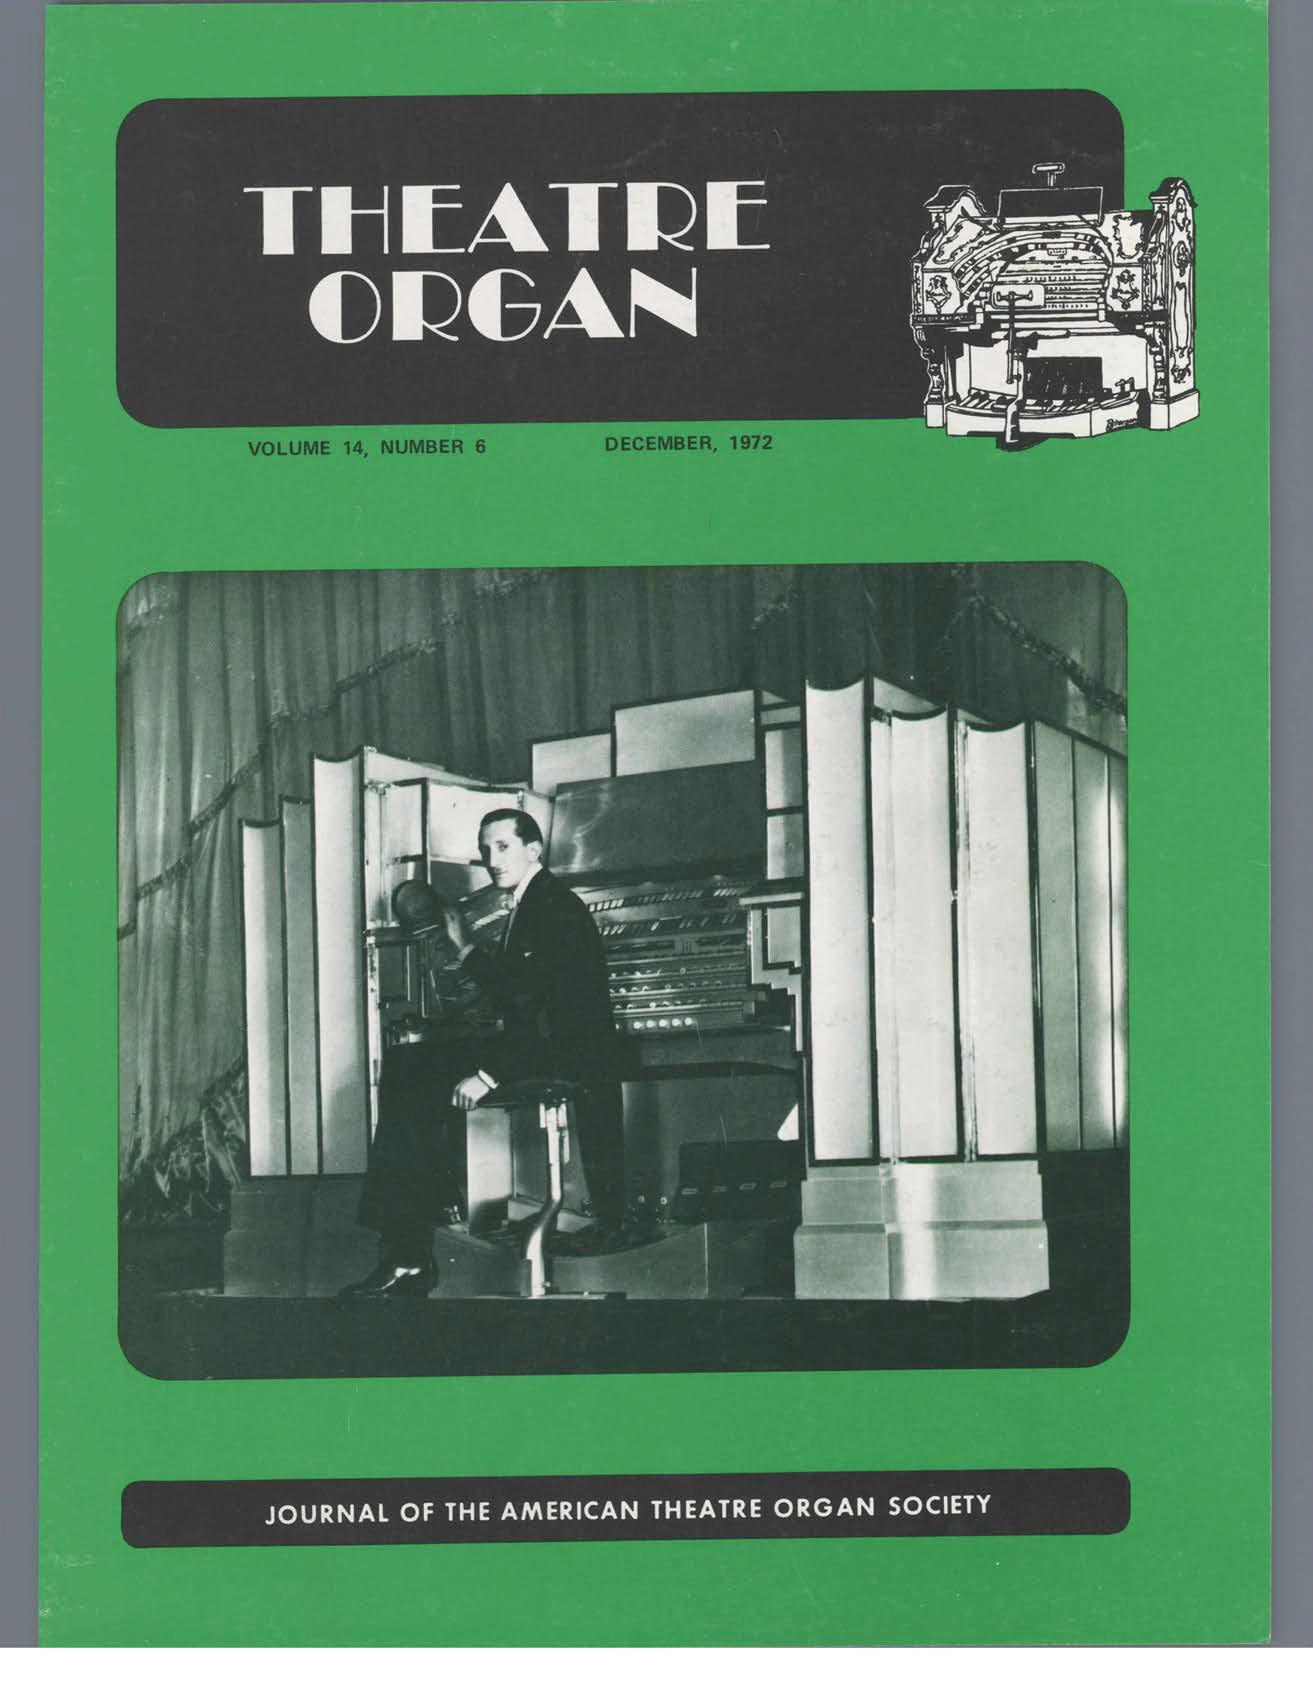 Theatre Organ, December 1972, Volume 14, Number 6